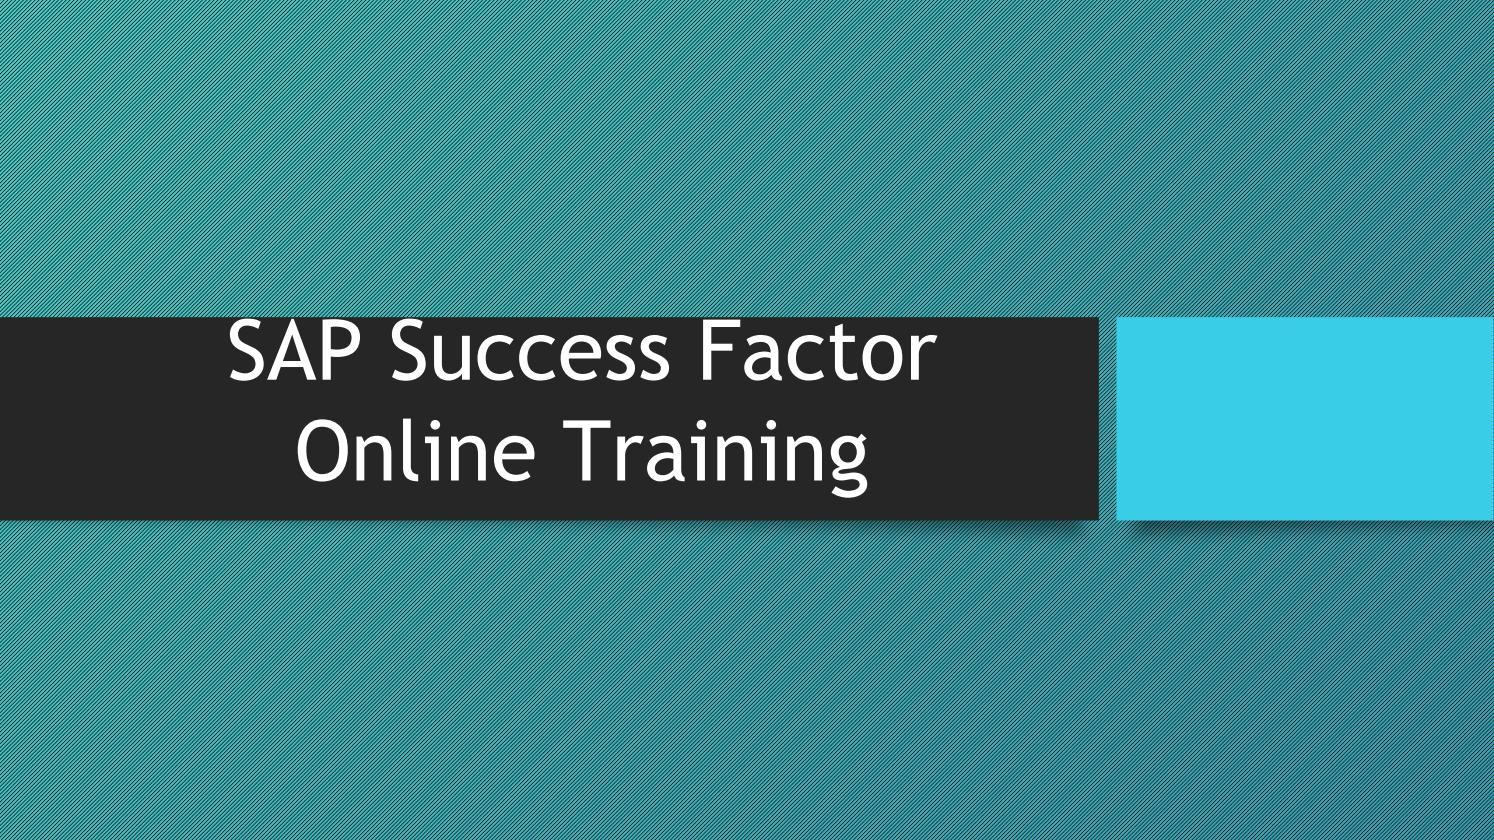 SAP Success Factors PPT by sonaliaitsdm001 - issuu